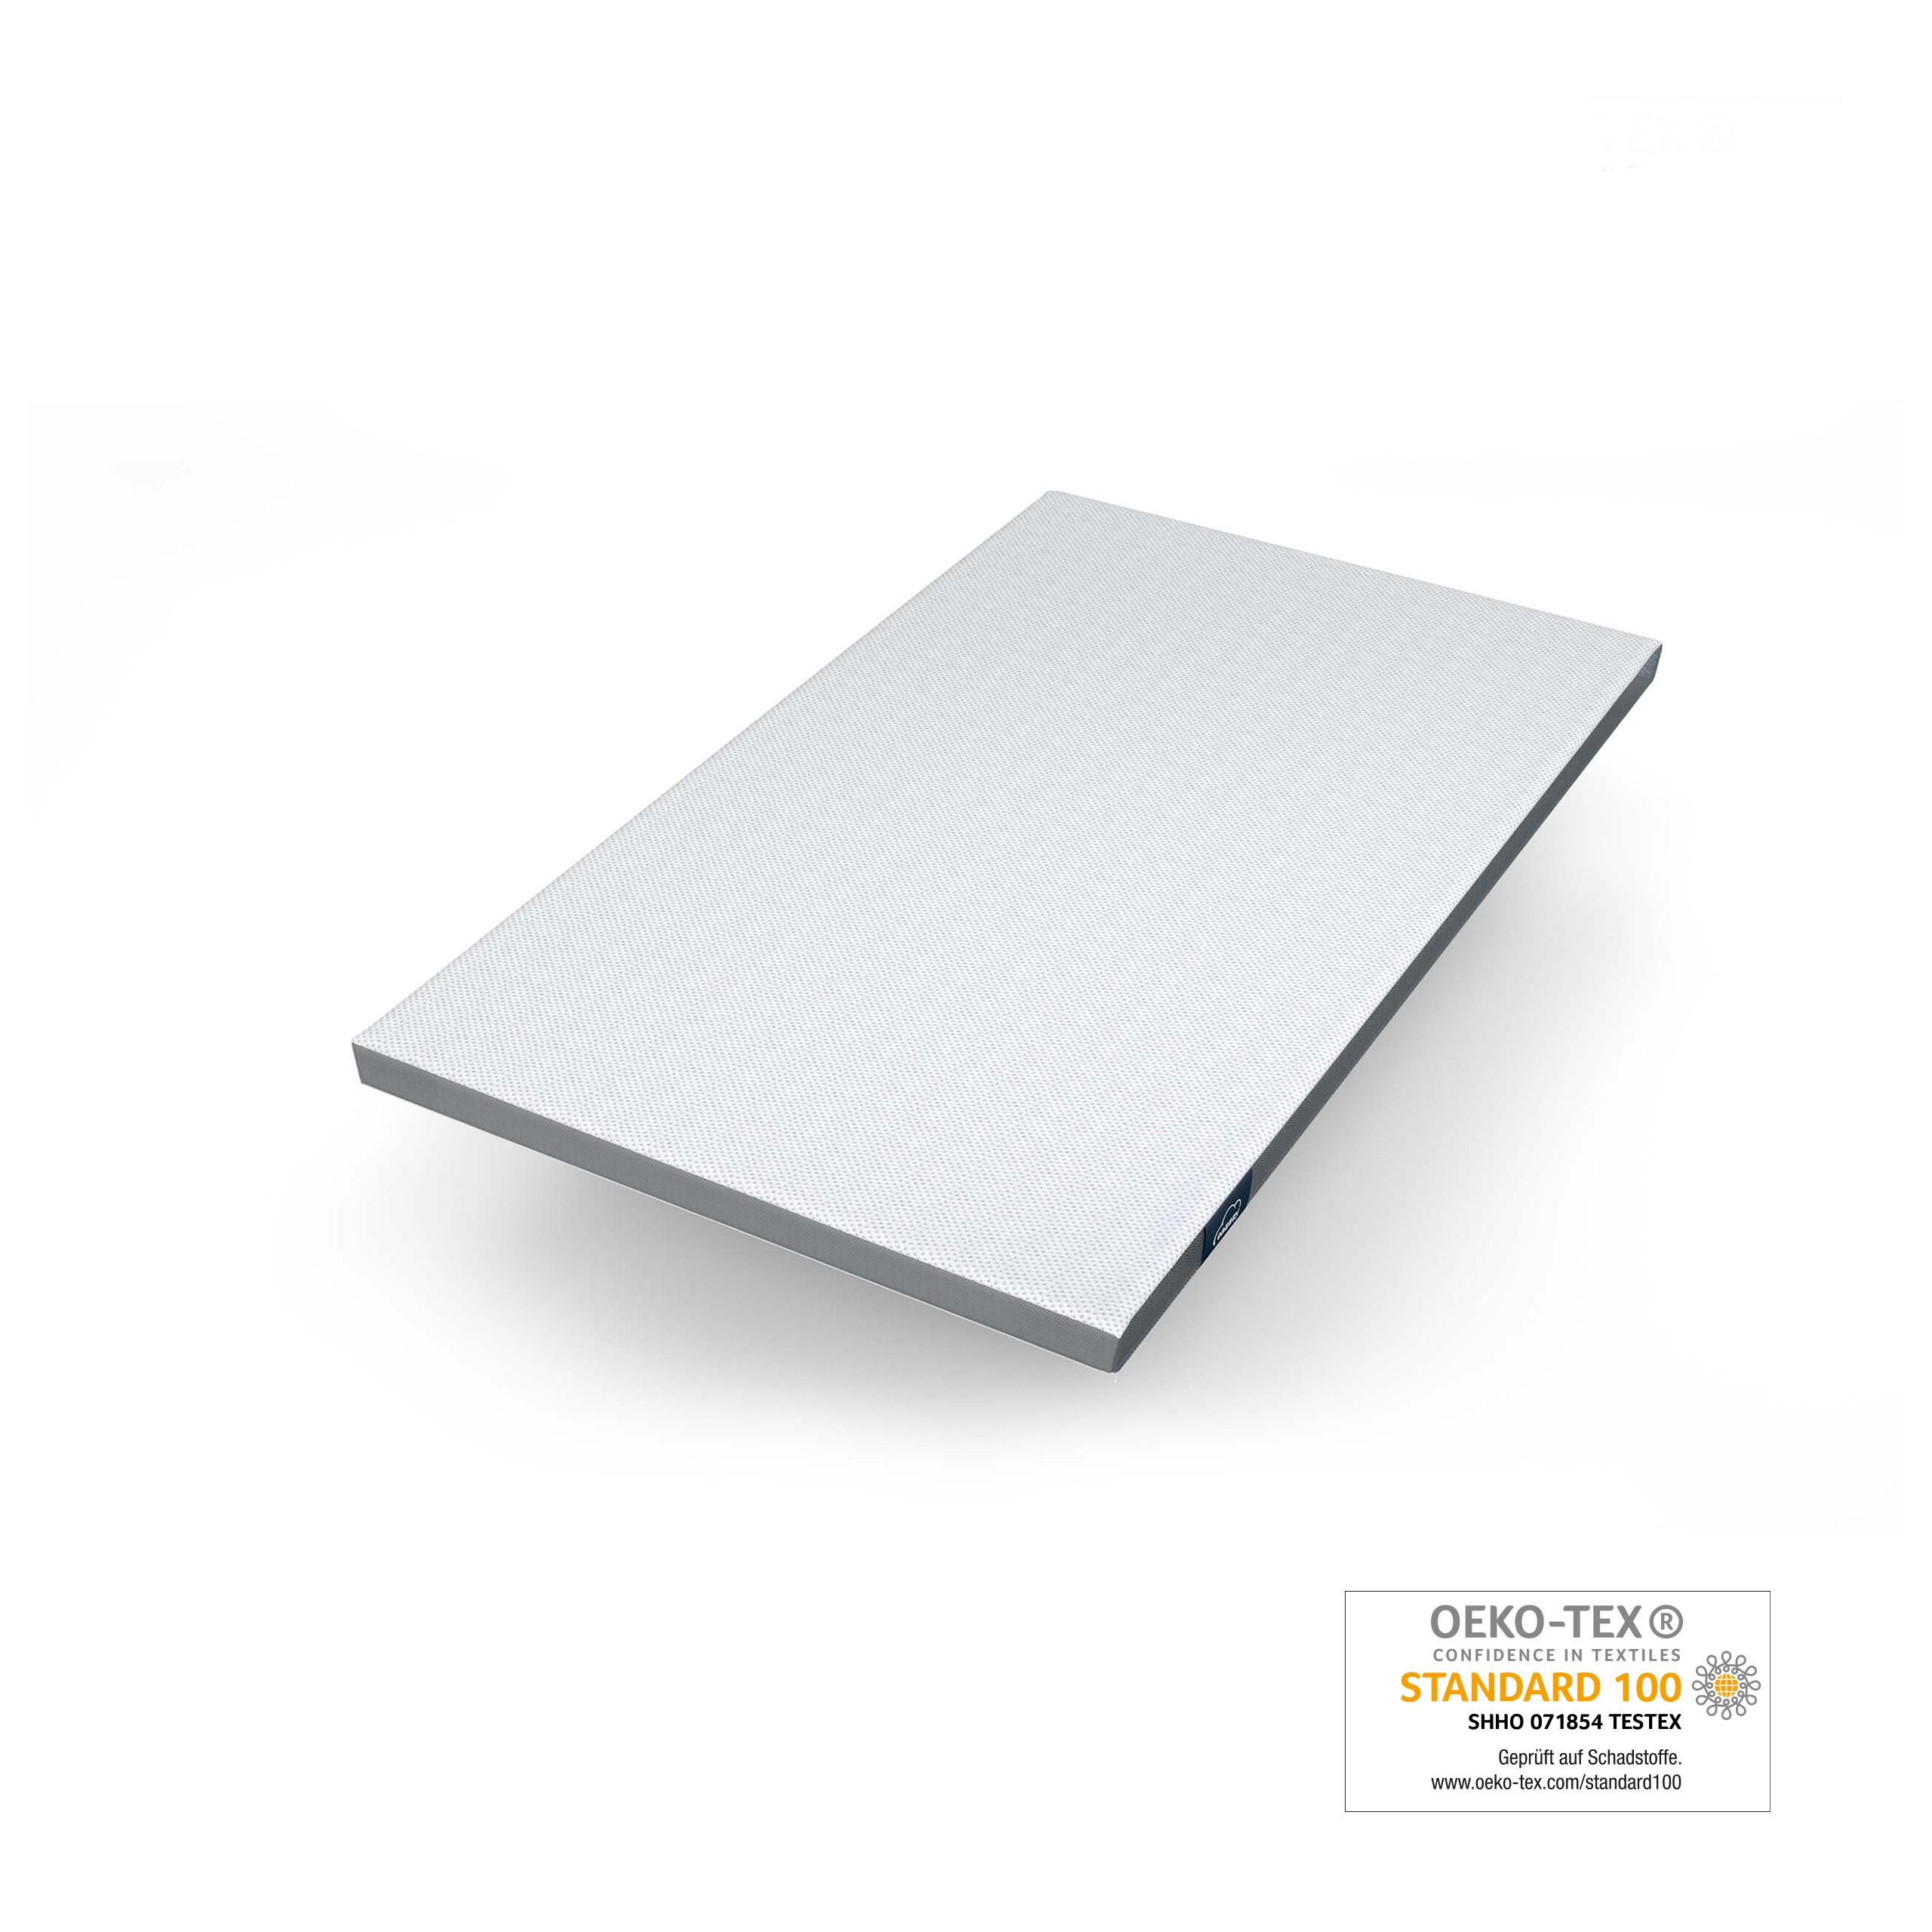 Genius eazzzy   Matratzentopper 120 x 200 x 7 cm A19245